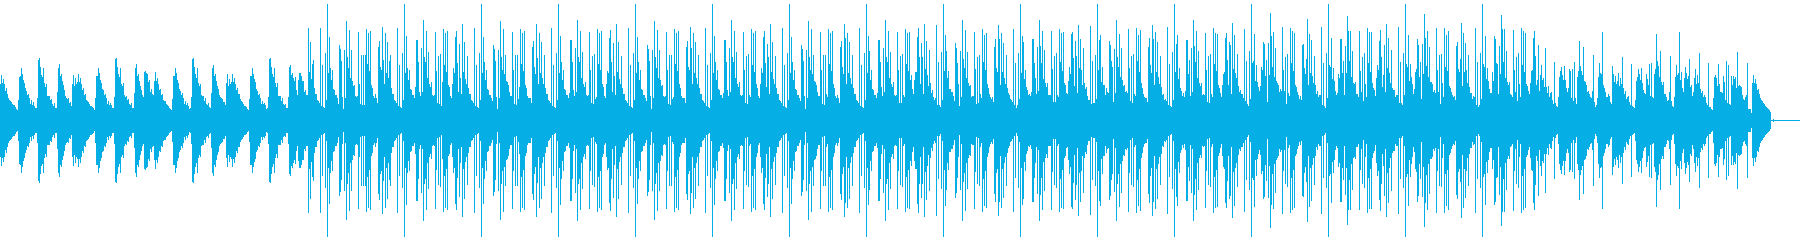 Lo-Fi チルアウト1の再生済みの波形